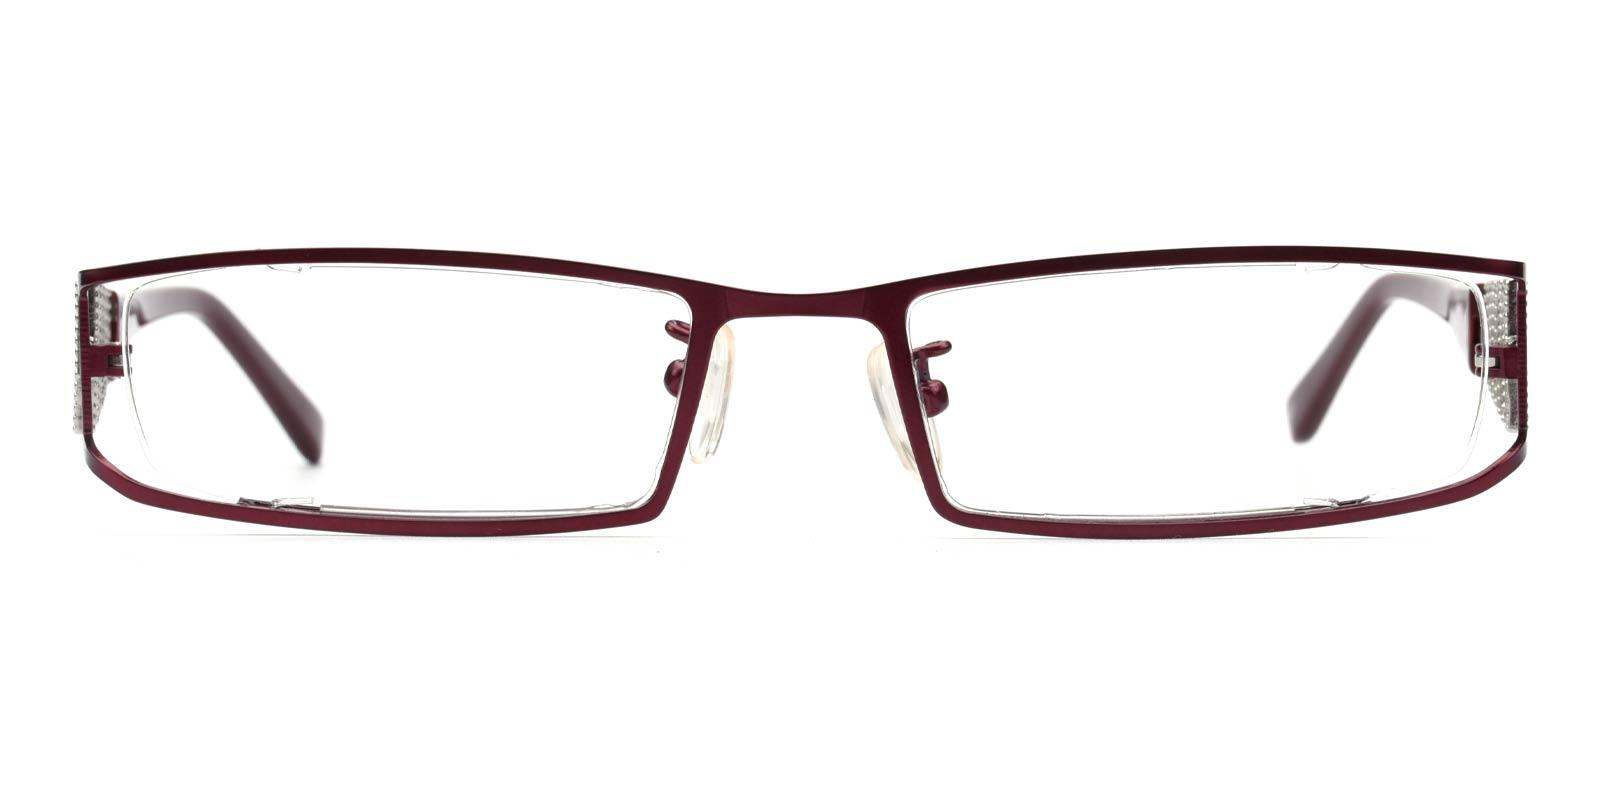 Akili-Red-Rectangle-Metal-Eyeglasses-additional2